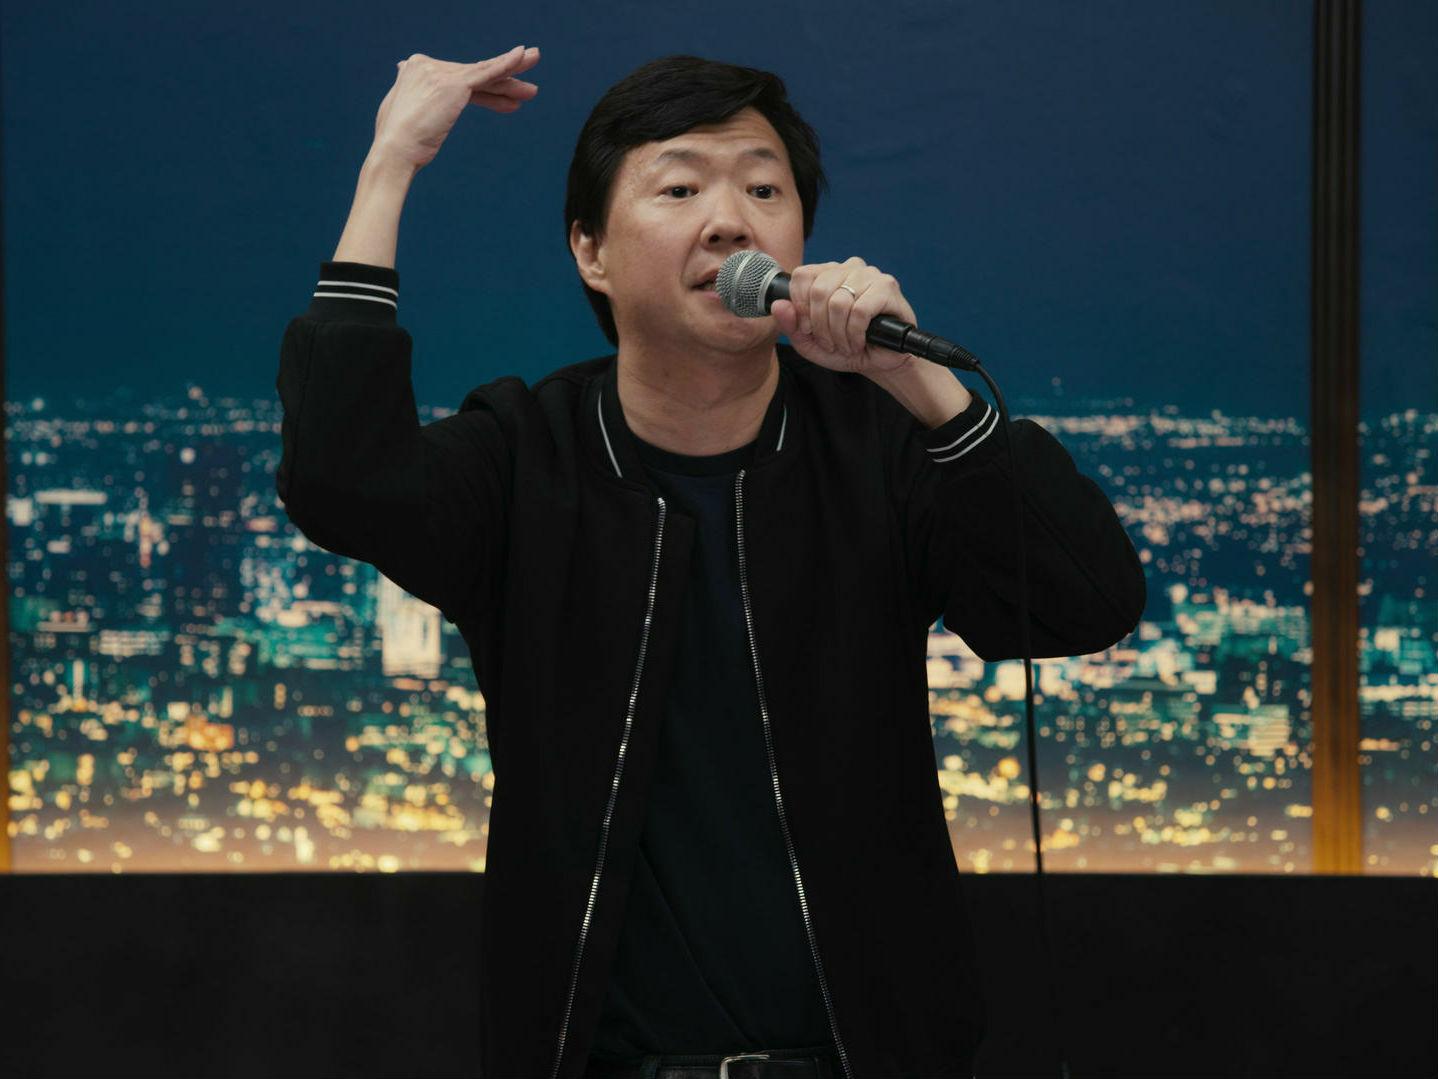 Ken Jeong: Me completas, Ho